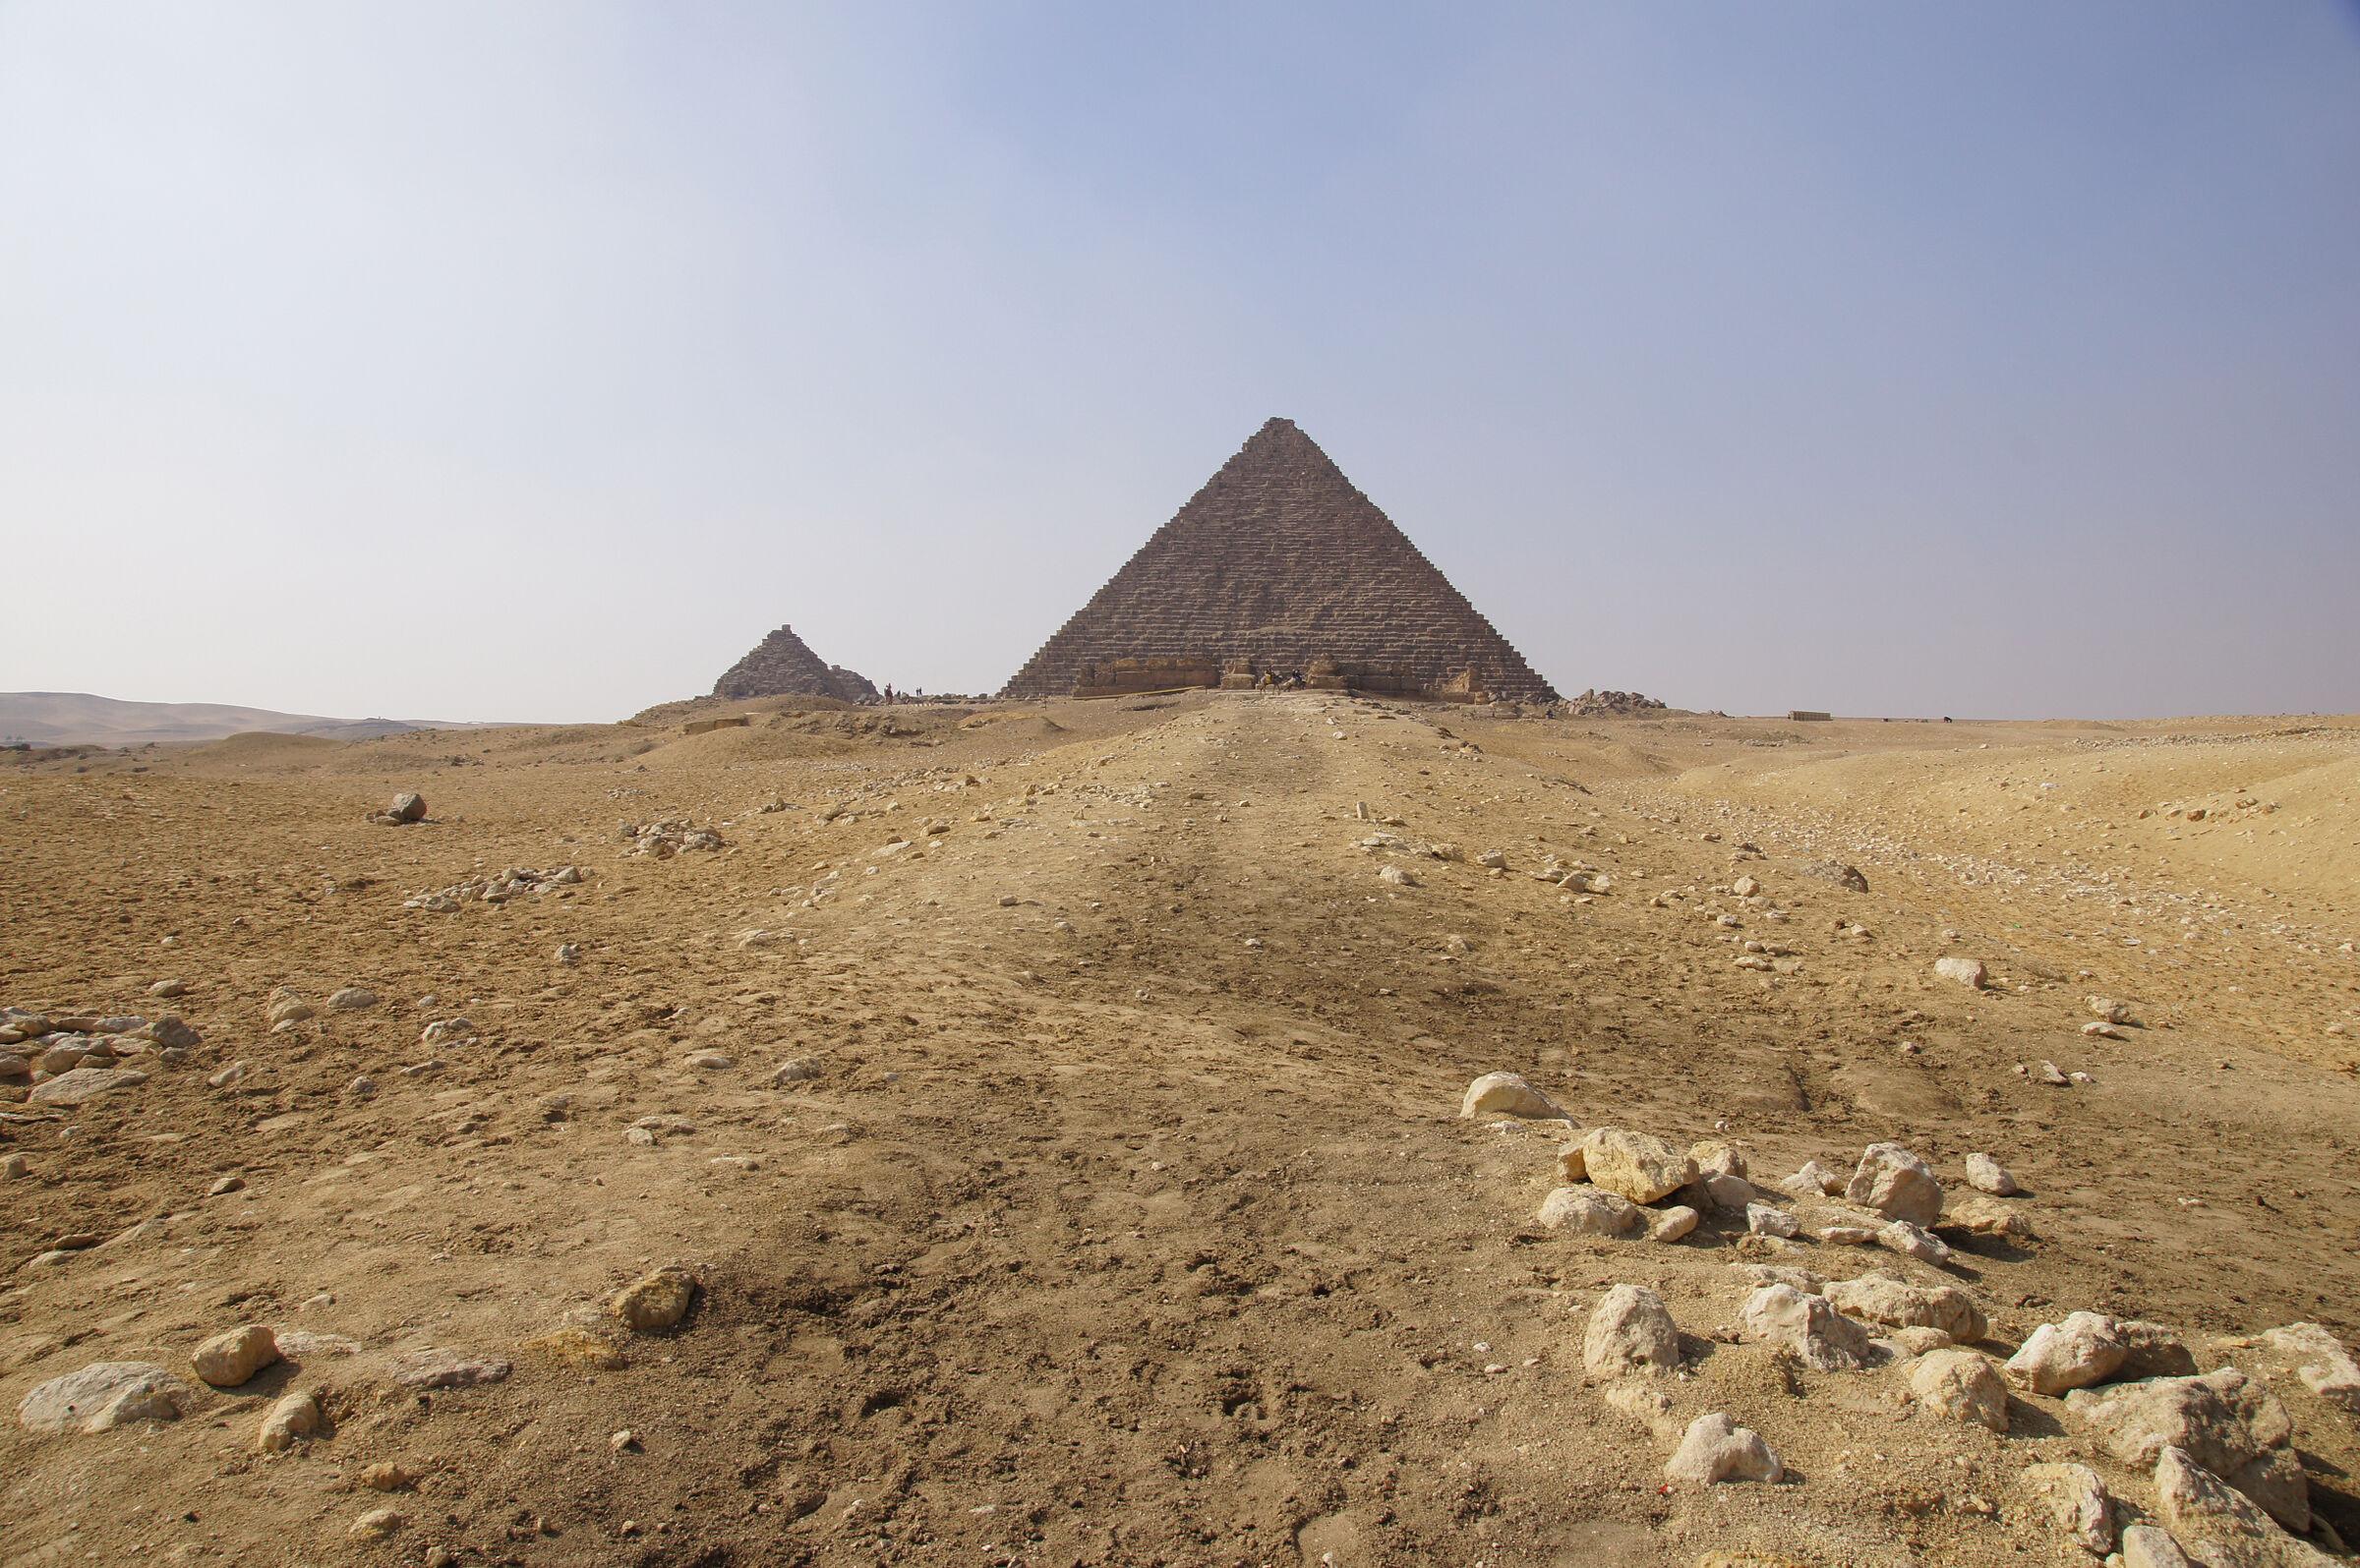 Menkaure Pyramid Complex: Site: Giza; View: Menkaure Causeway, Menkaure Pyramid Temple, Menkaure Pyramid